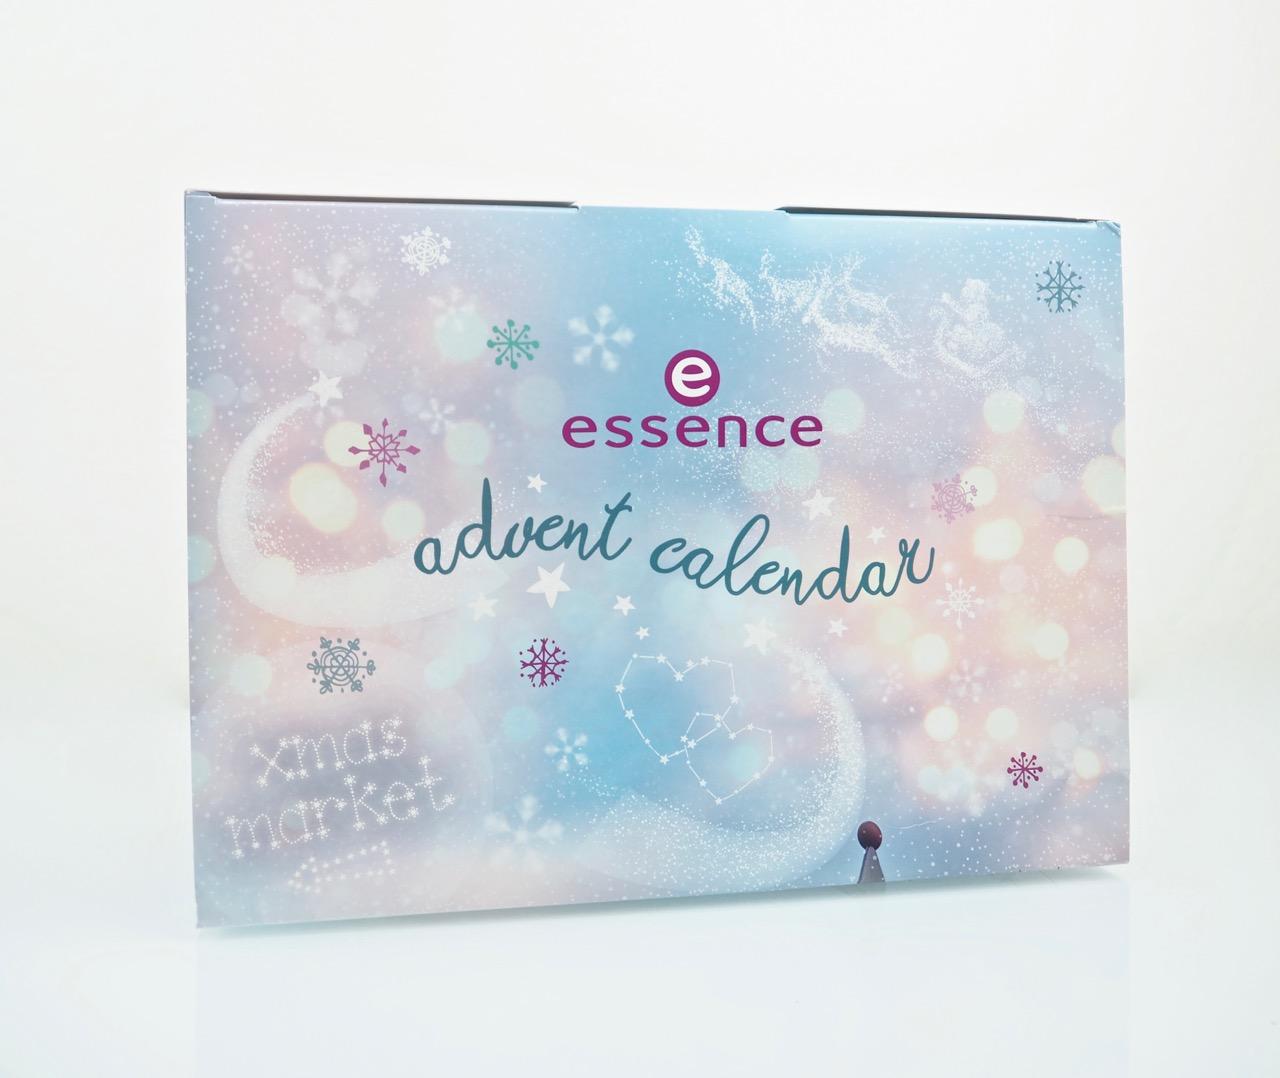 Essence Advent Calendar 2018 joulukalenteri Ostolakossa Virve Vee